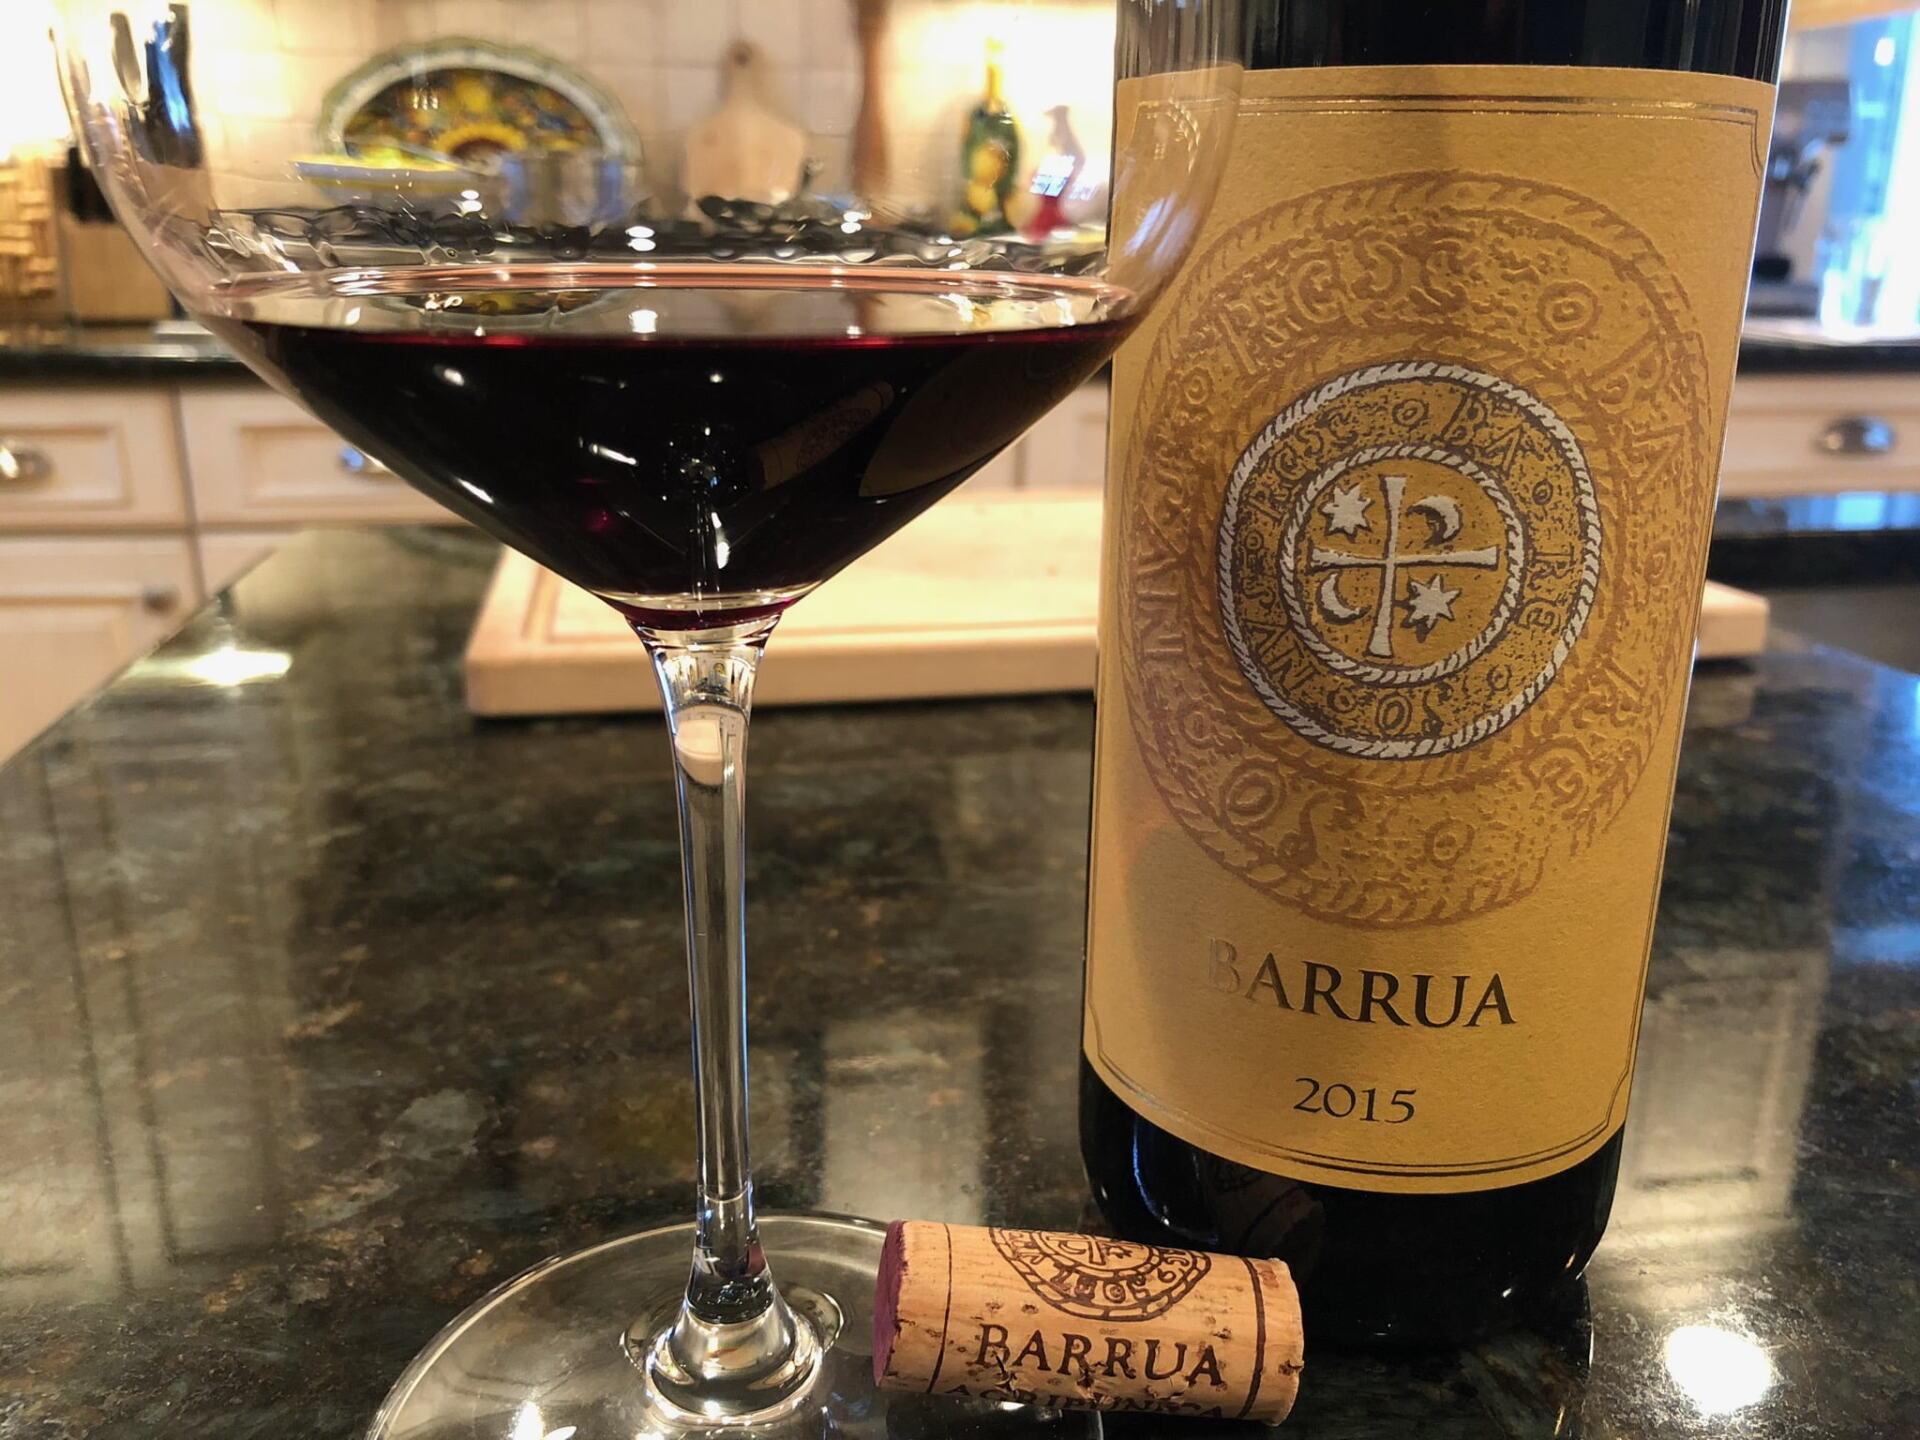 Barrua in the bottle